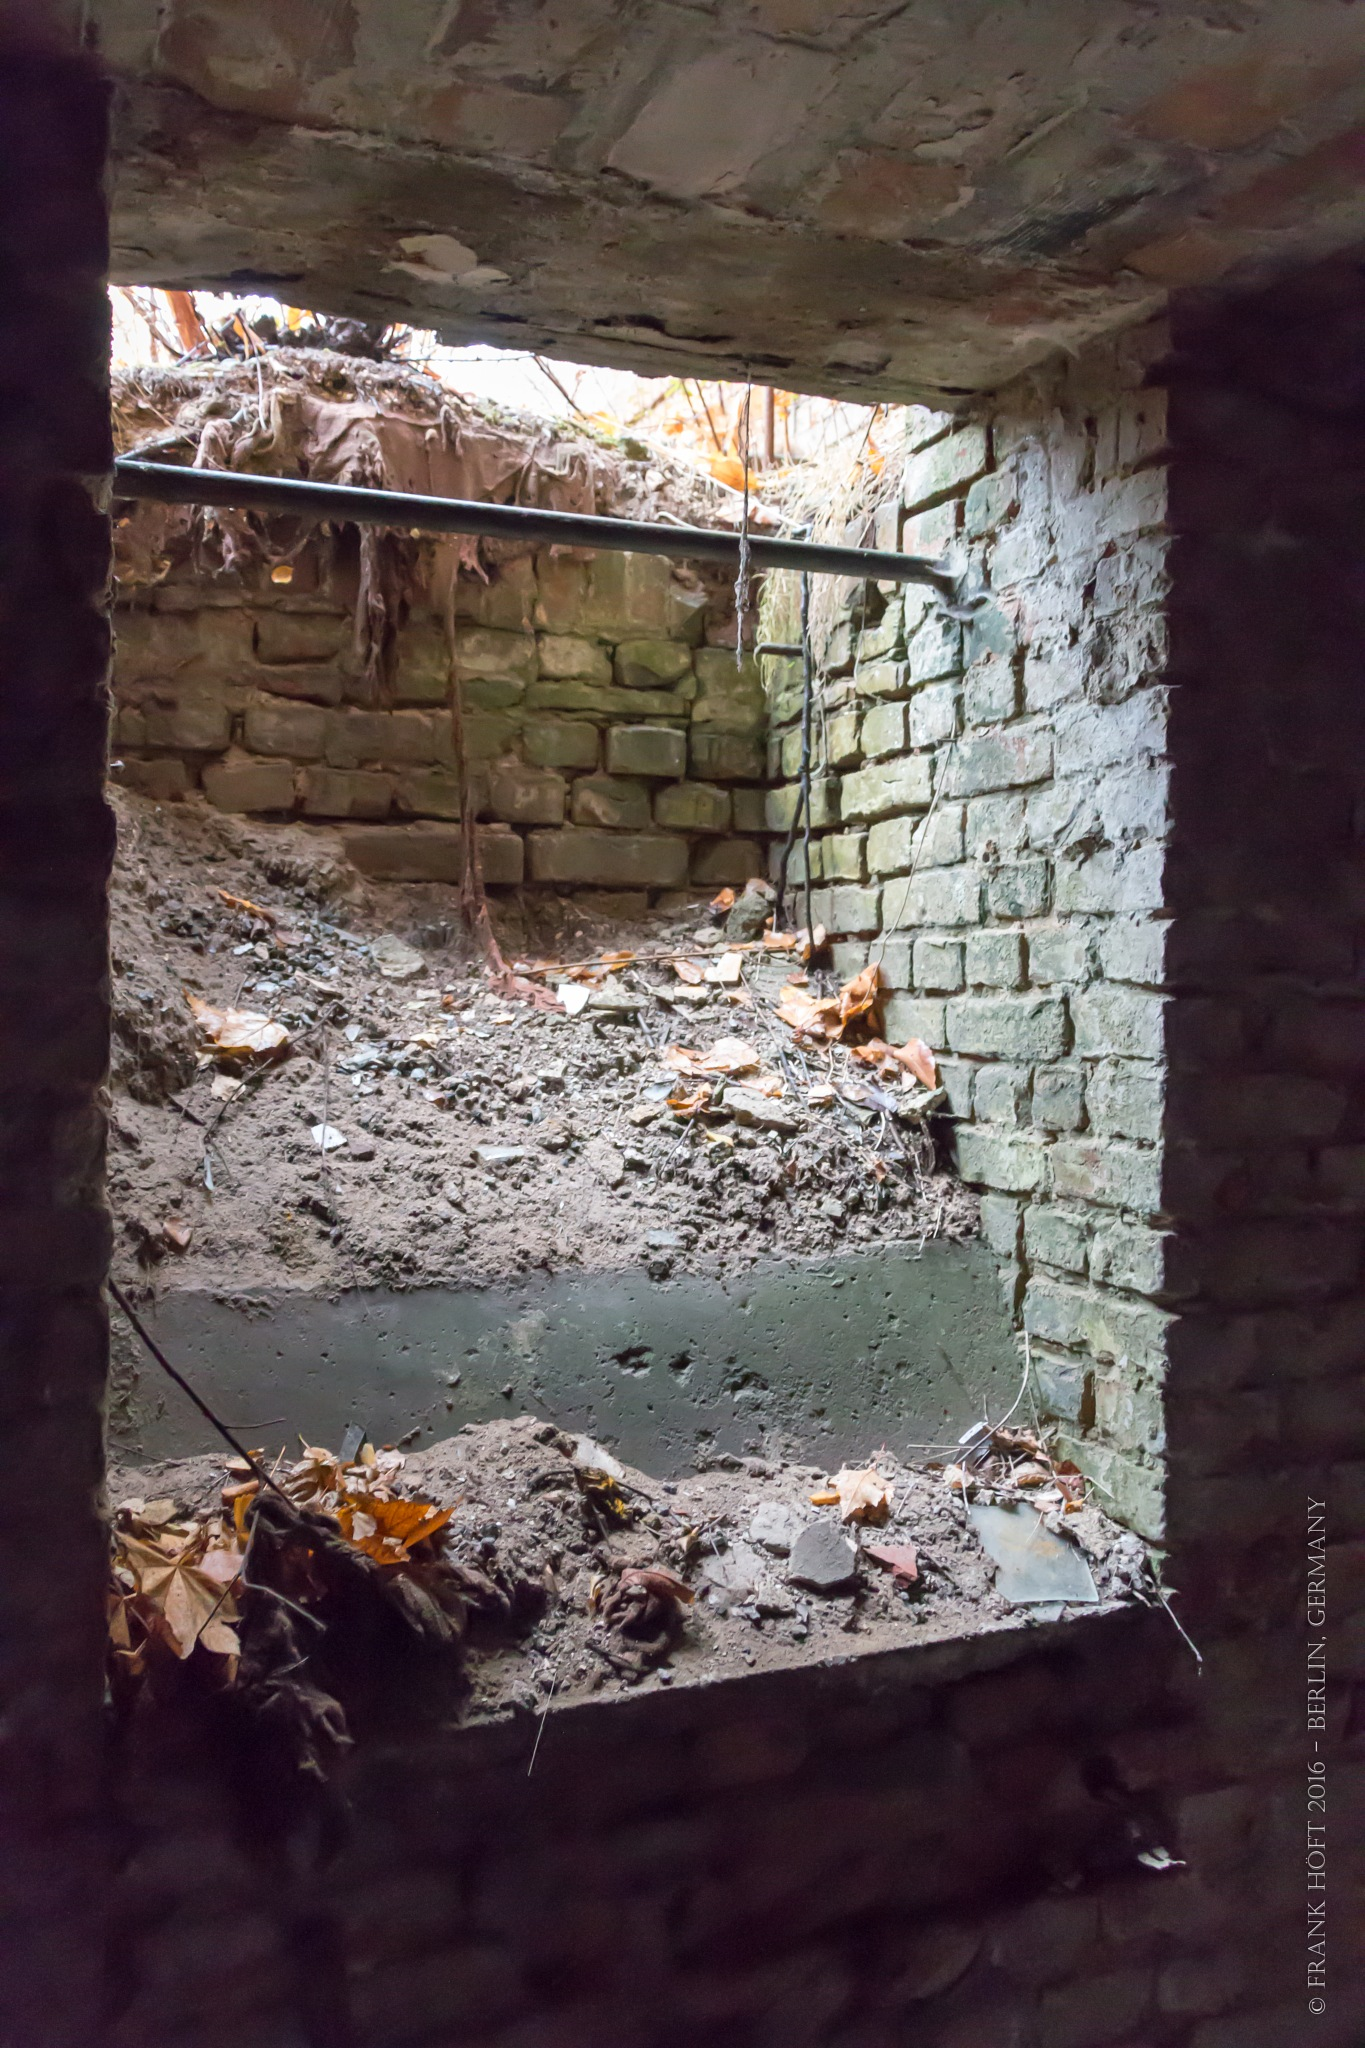 cellar light shaft by Frank Höft